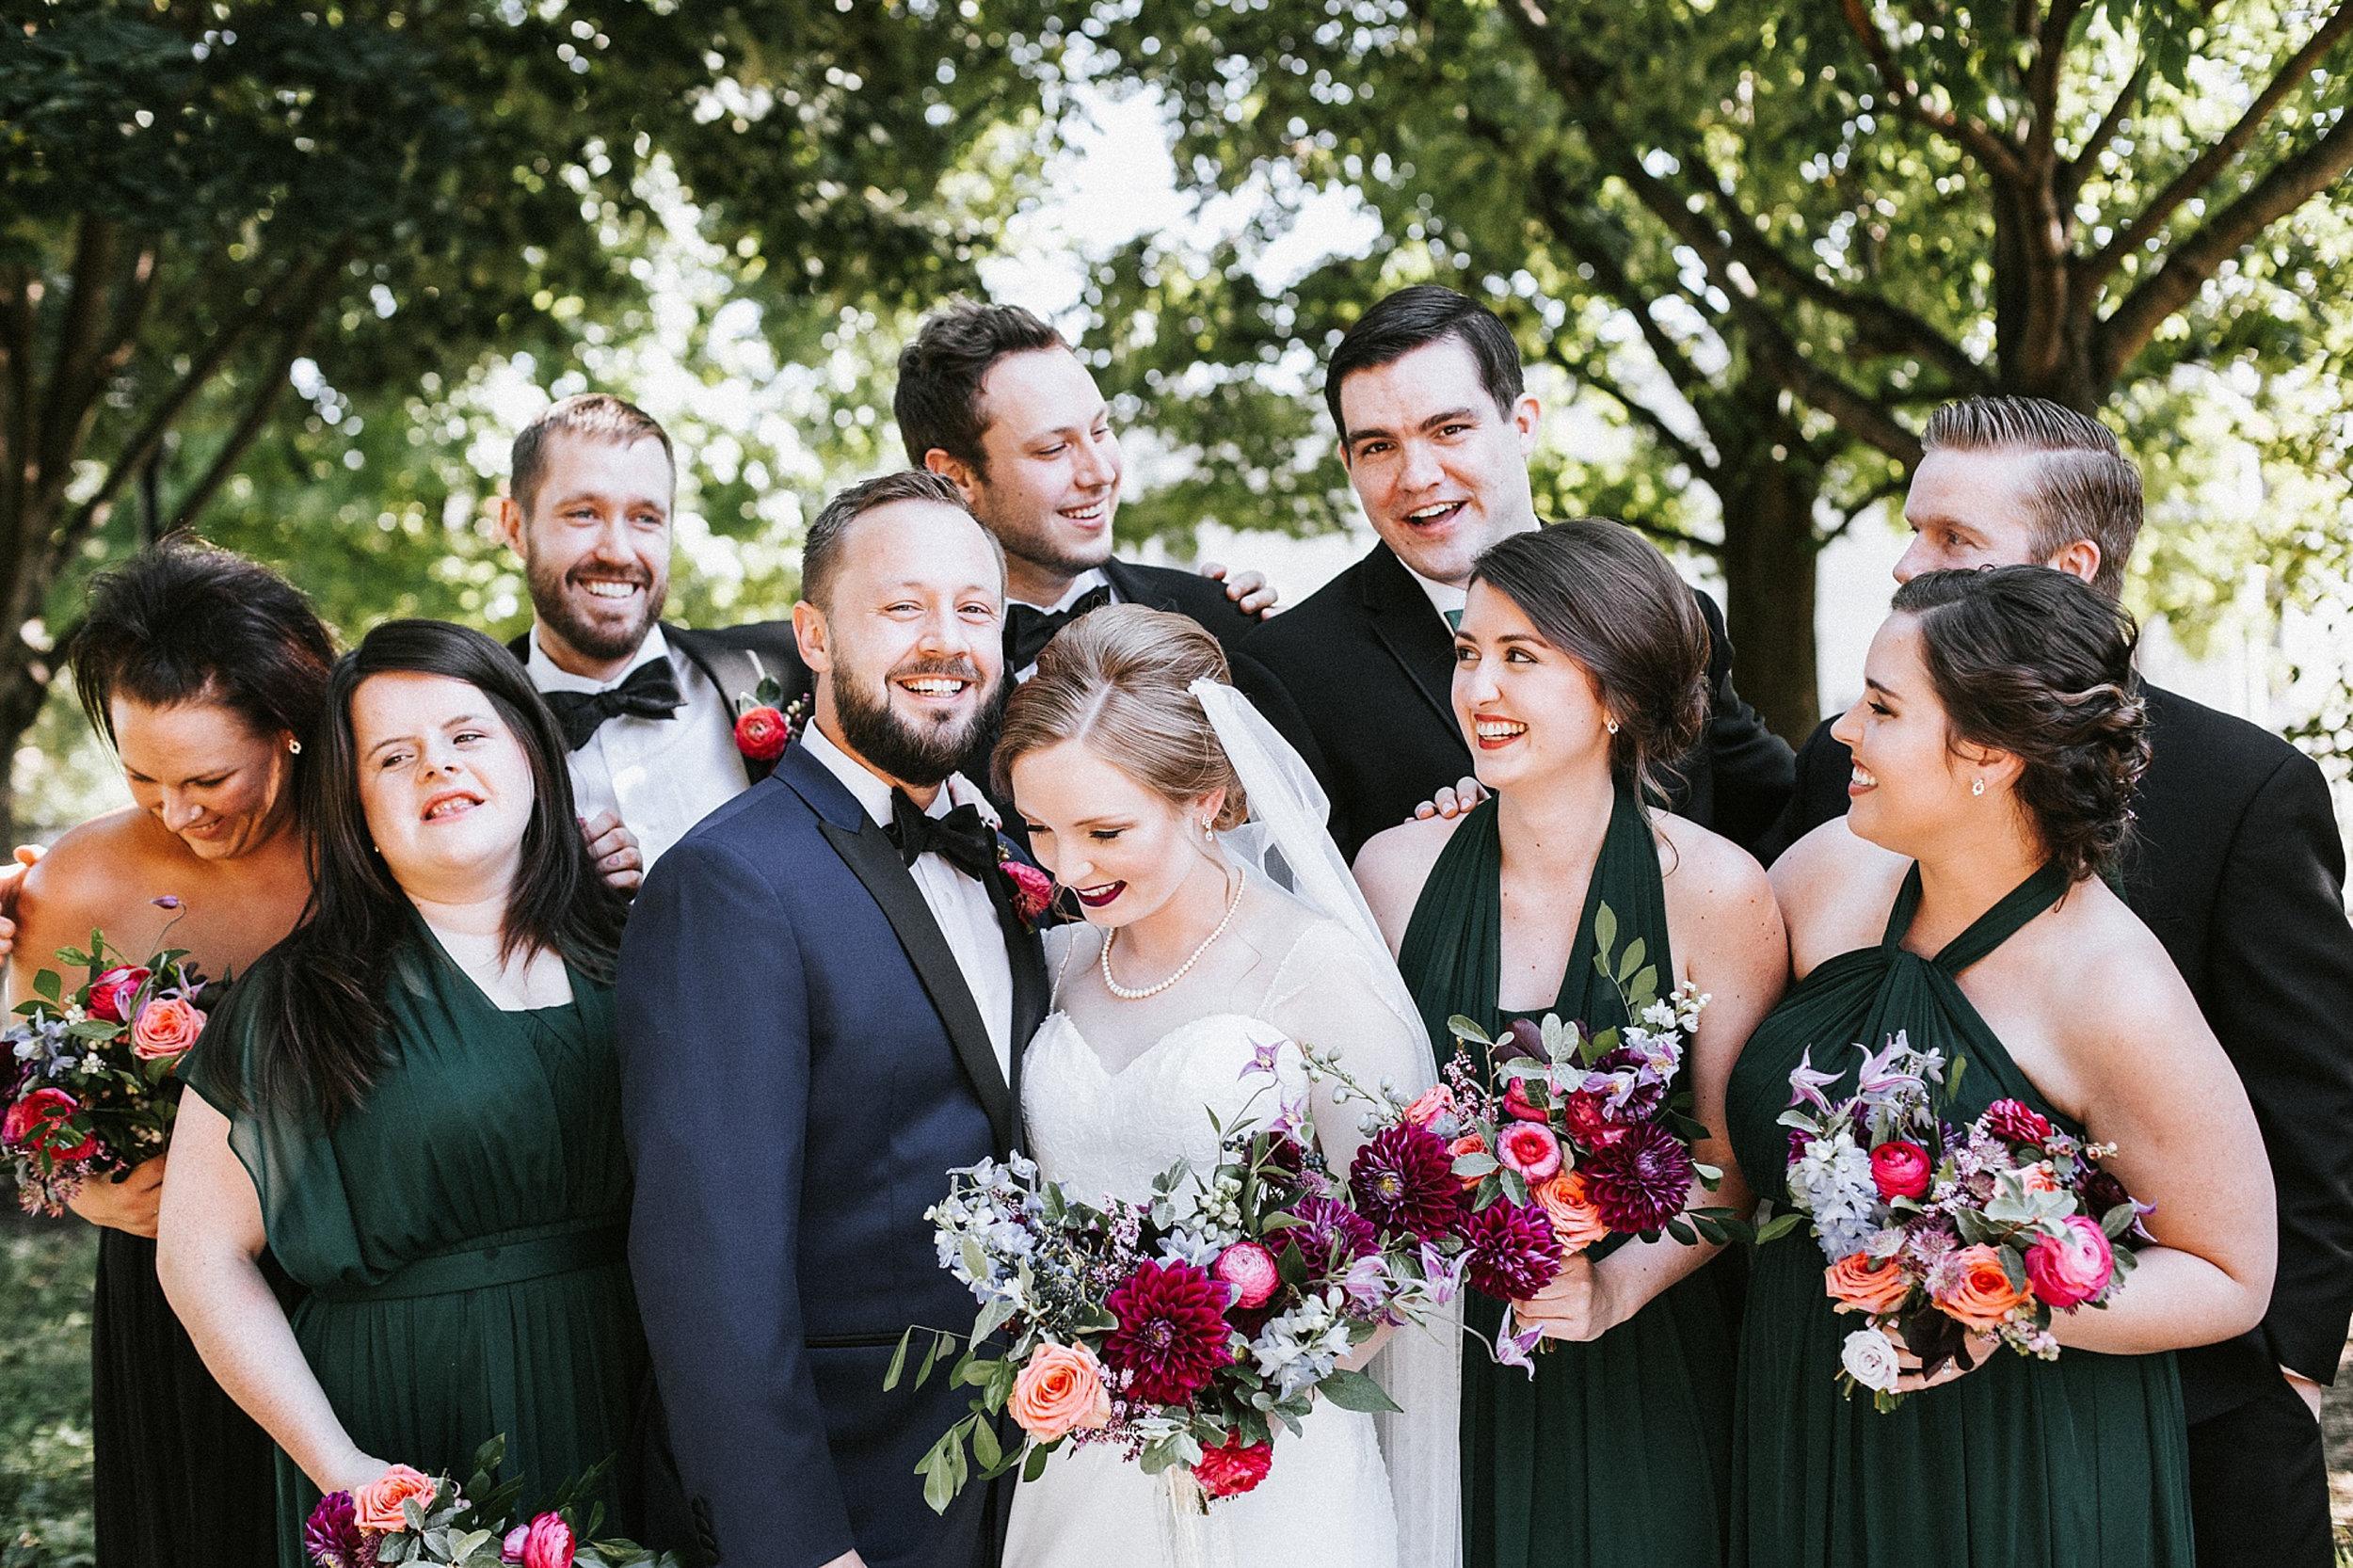 Brooke Townsend Photography - Ohio Wedding Photographer-74.jpg